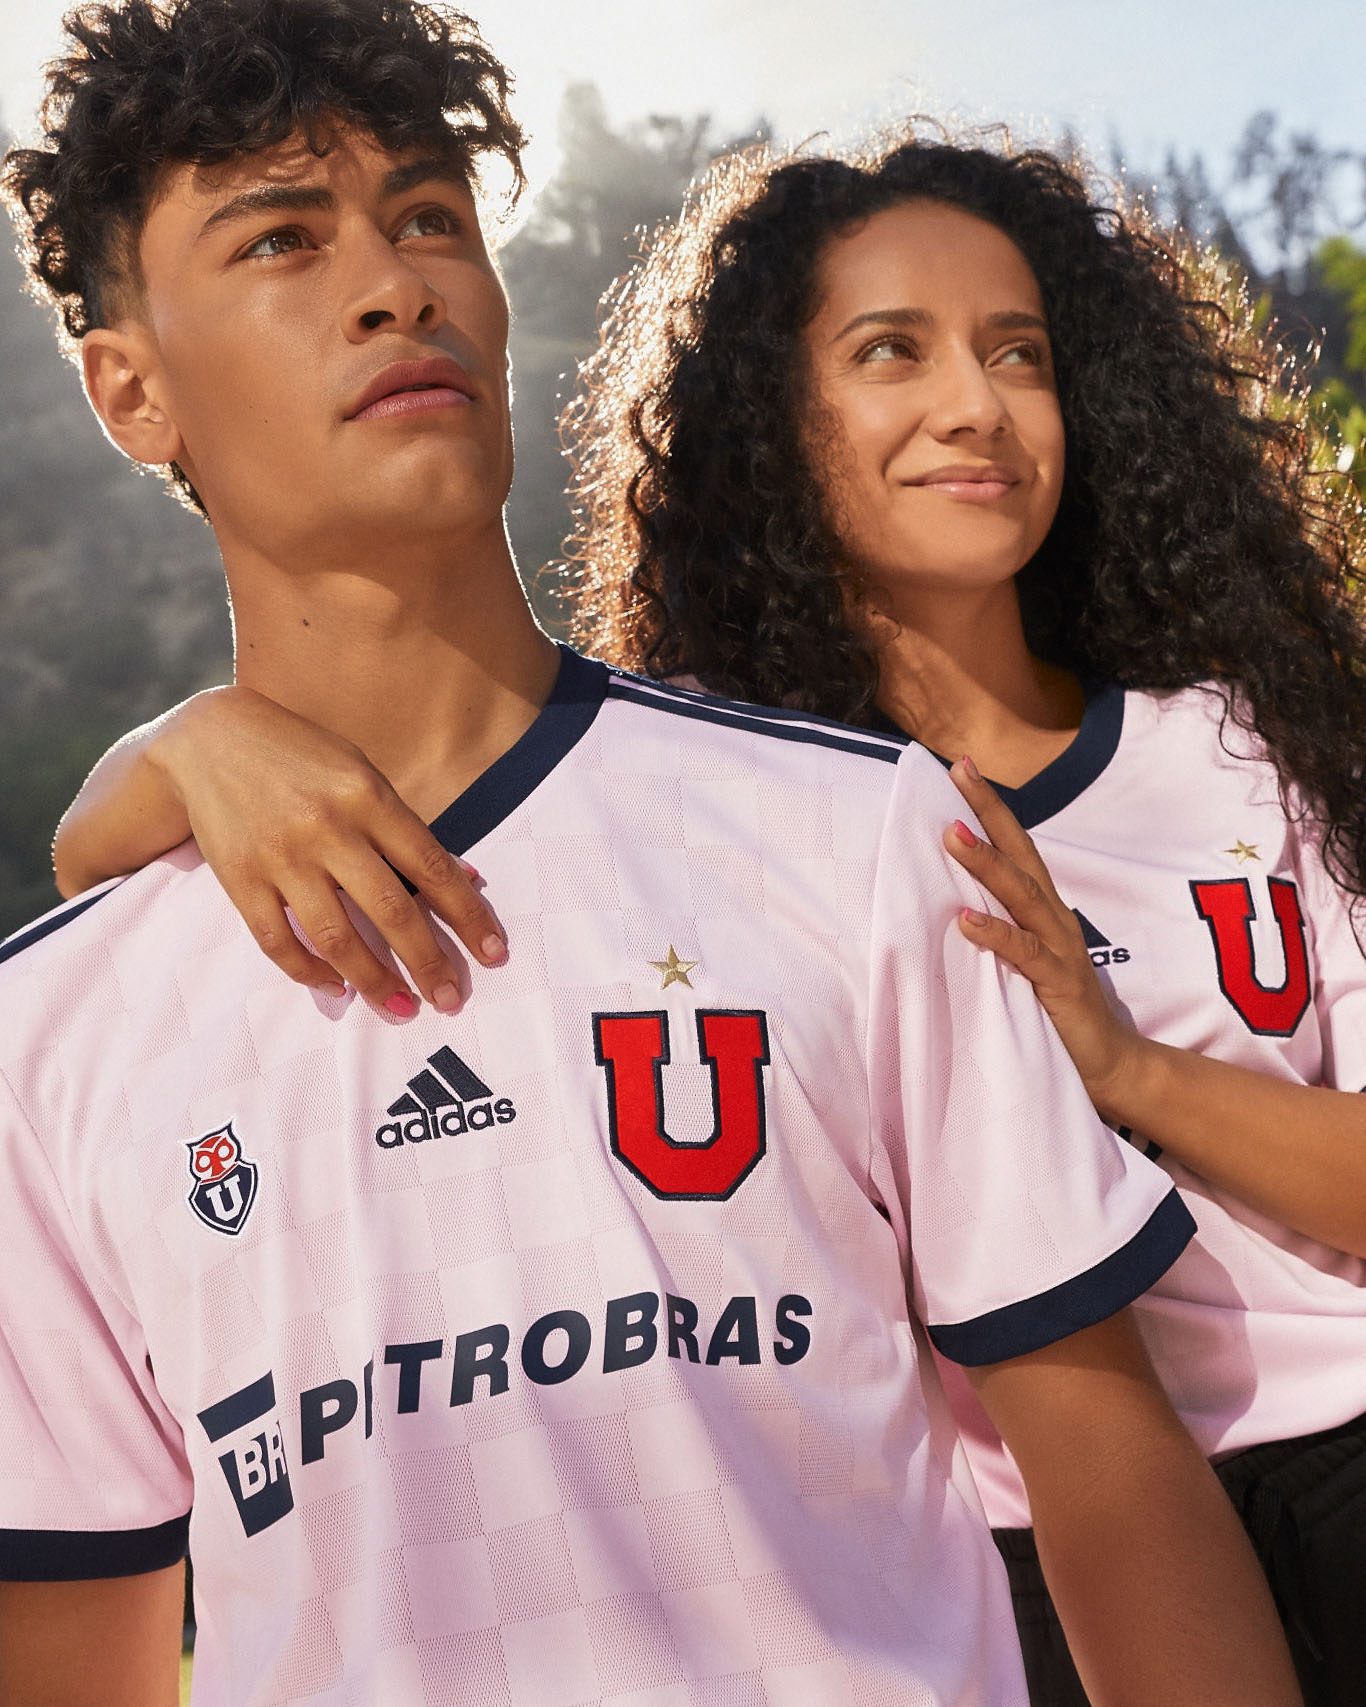 Camisa reserva da Universidad de Chile 2021 Adidas